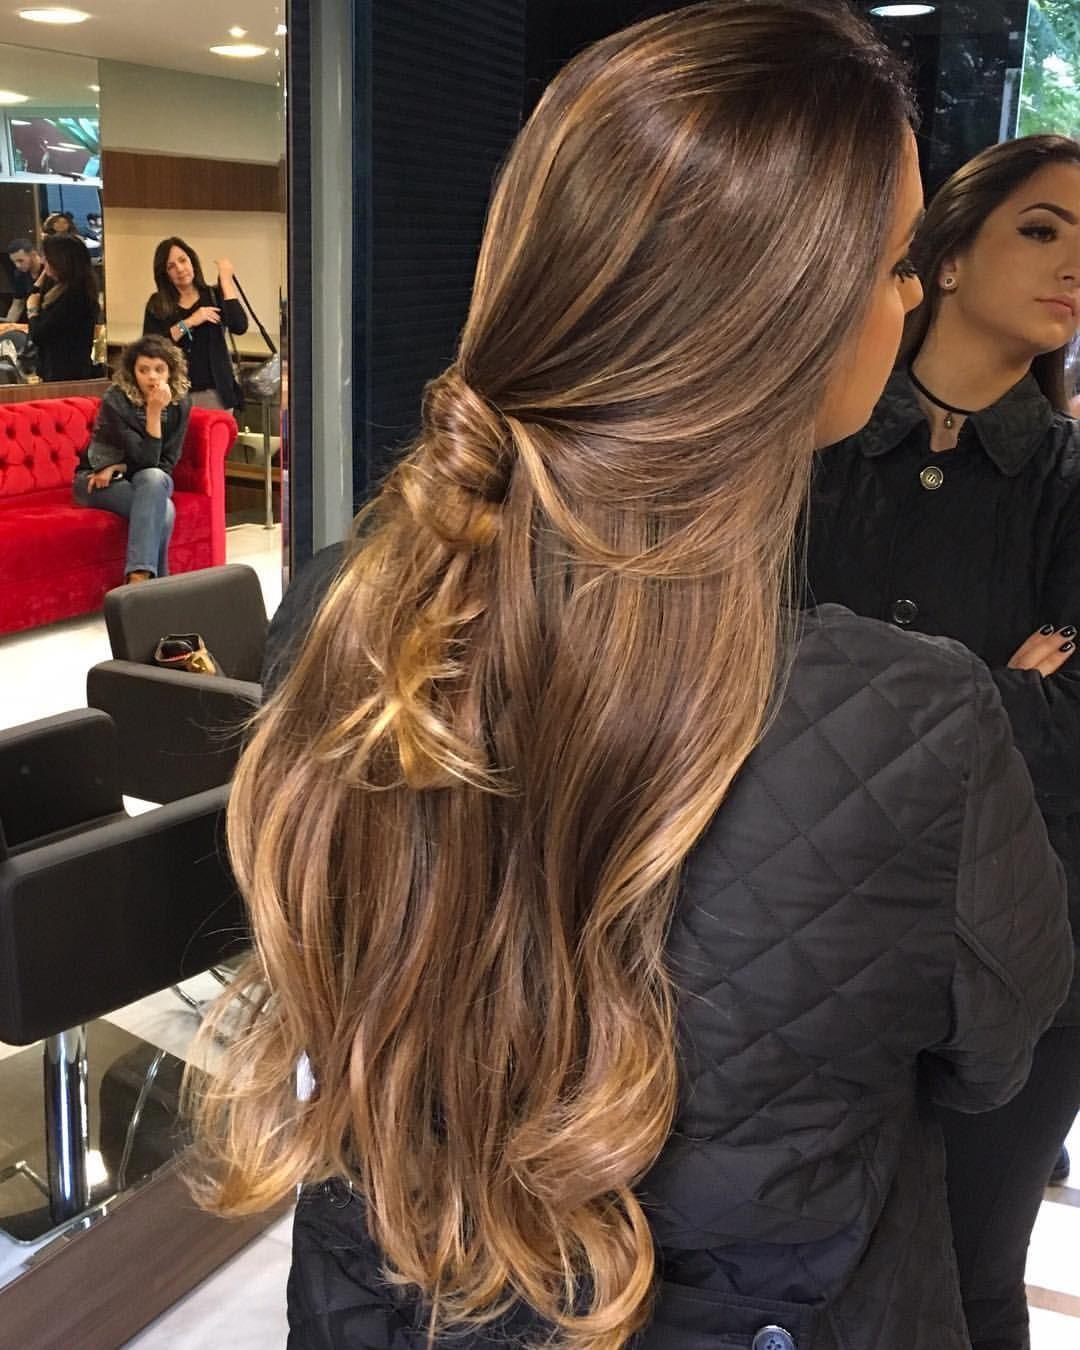 Hair Inspiration 2019-07-08 21:01:40